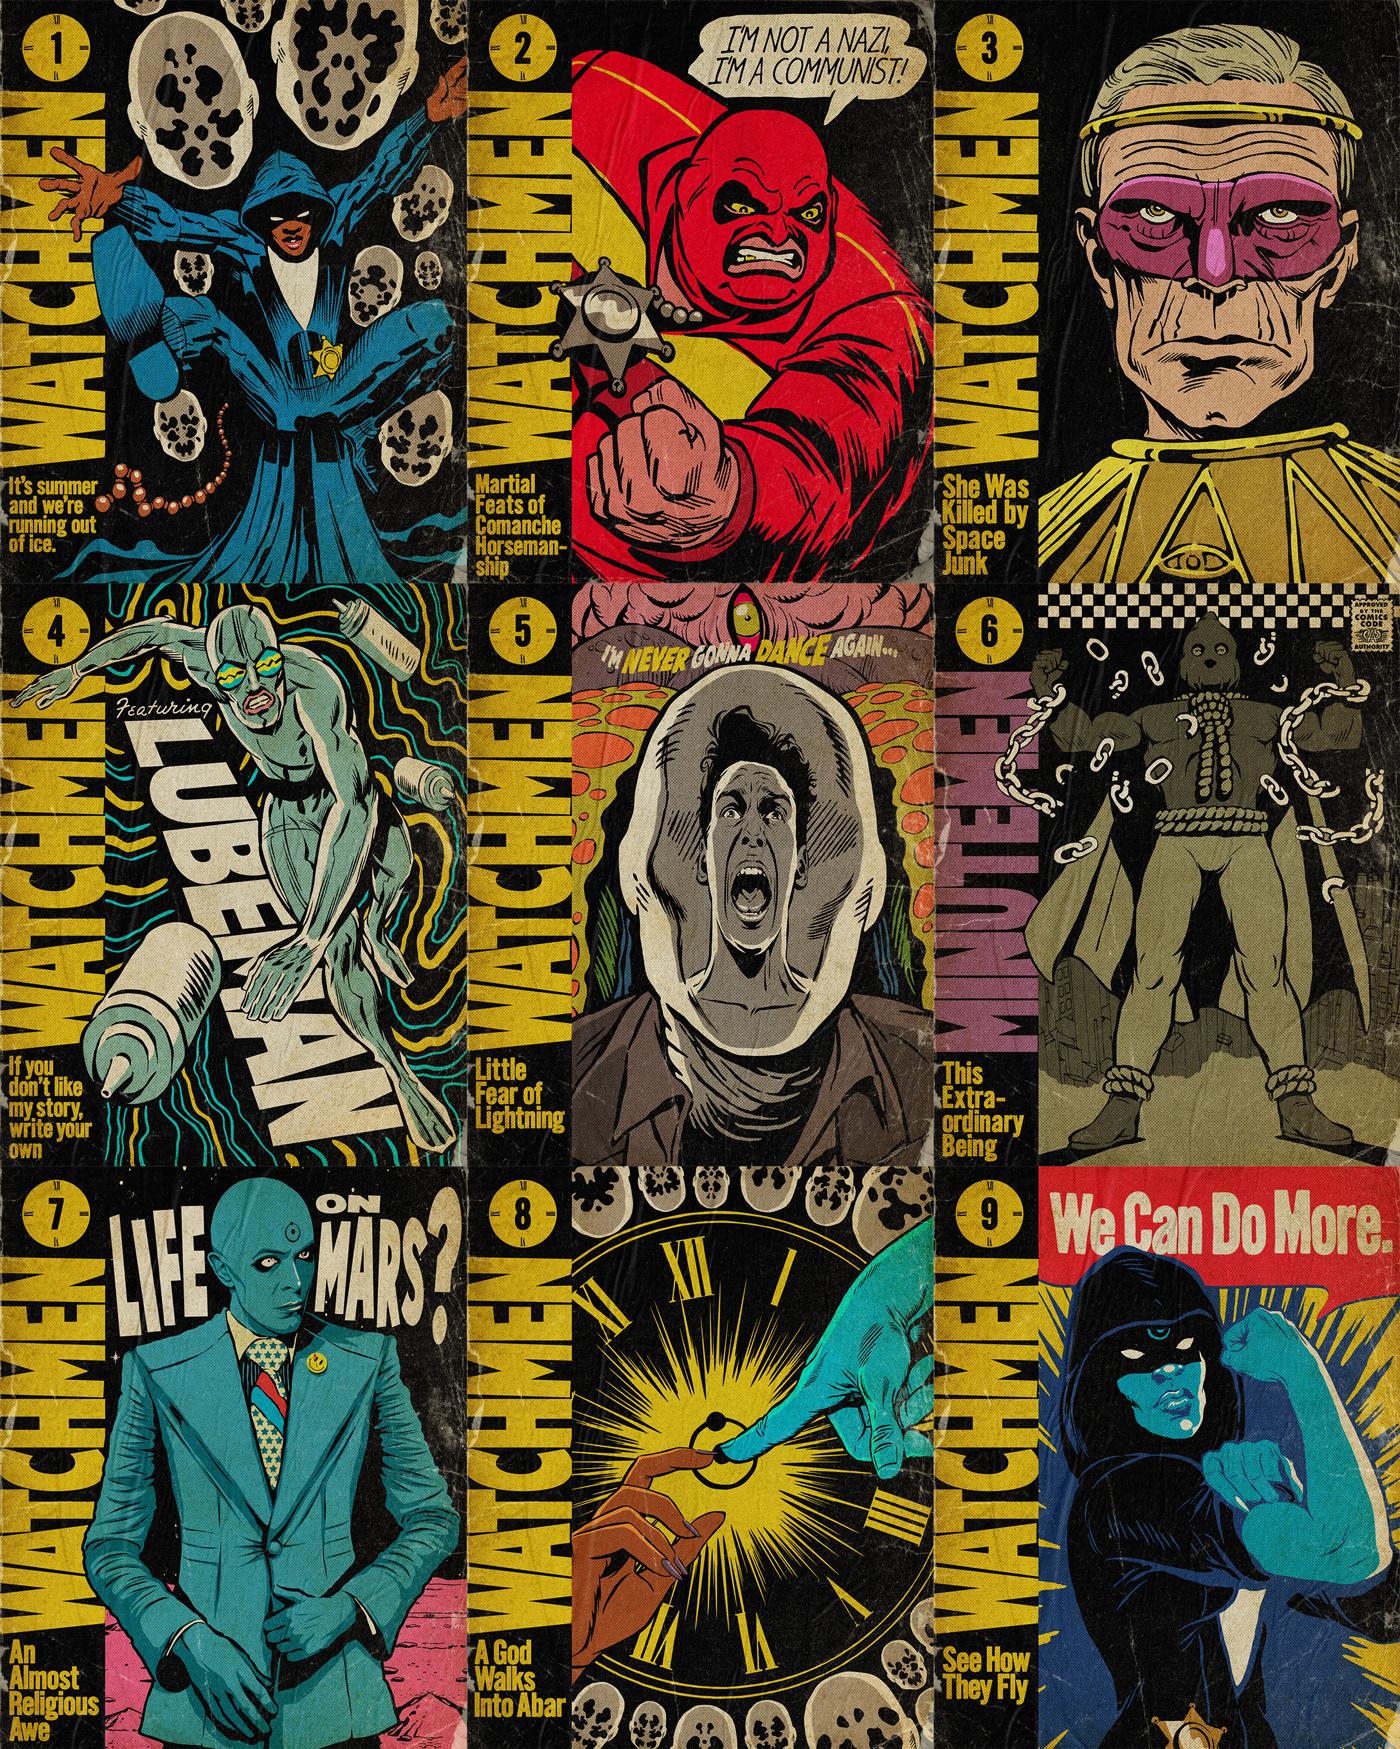 WatchMen hbo comics vintage Retro Sister Night looking glass alan moore DAMON LINDELOF dr. manhattan